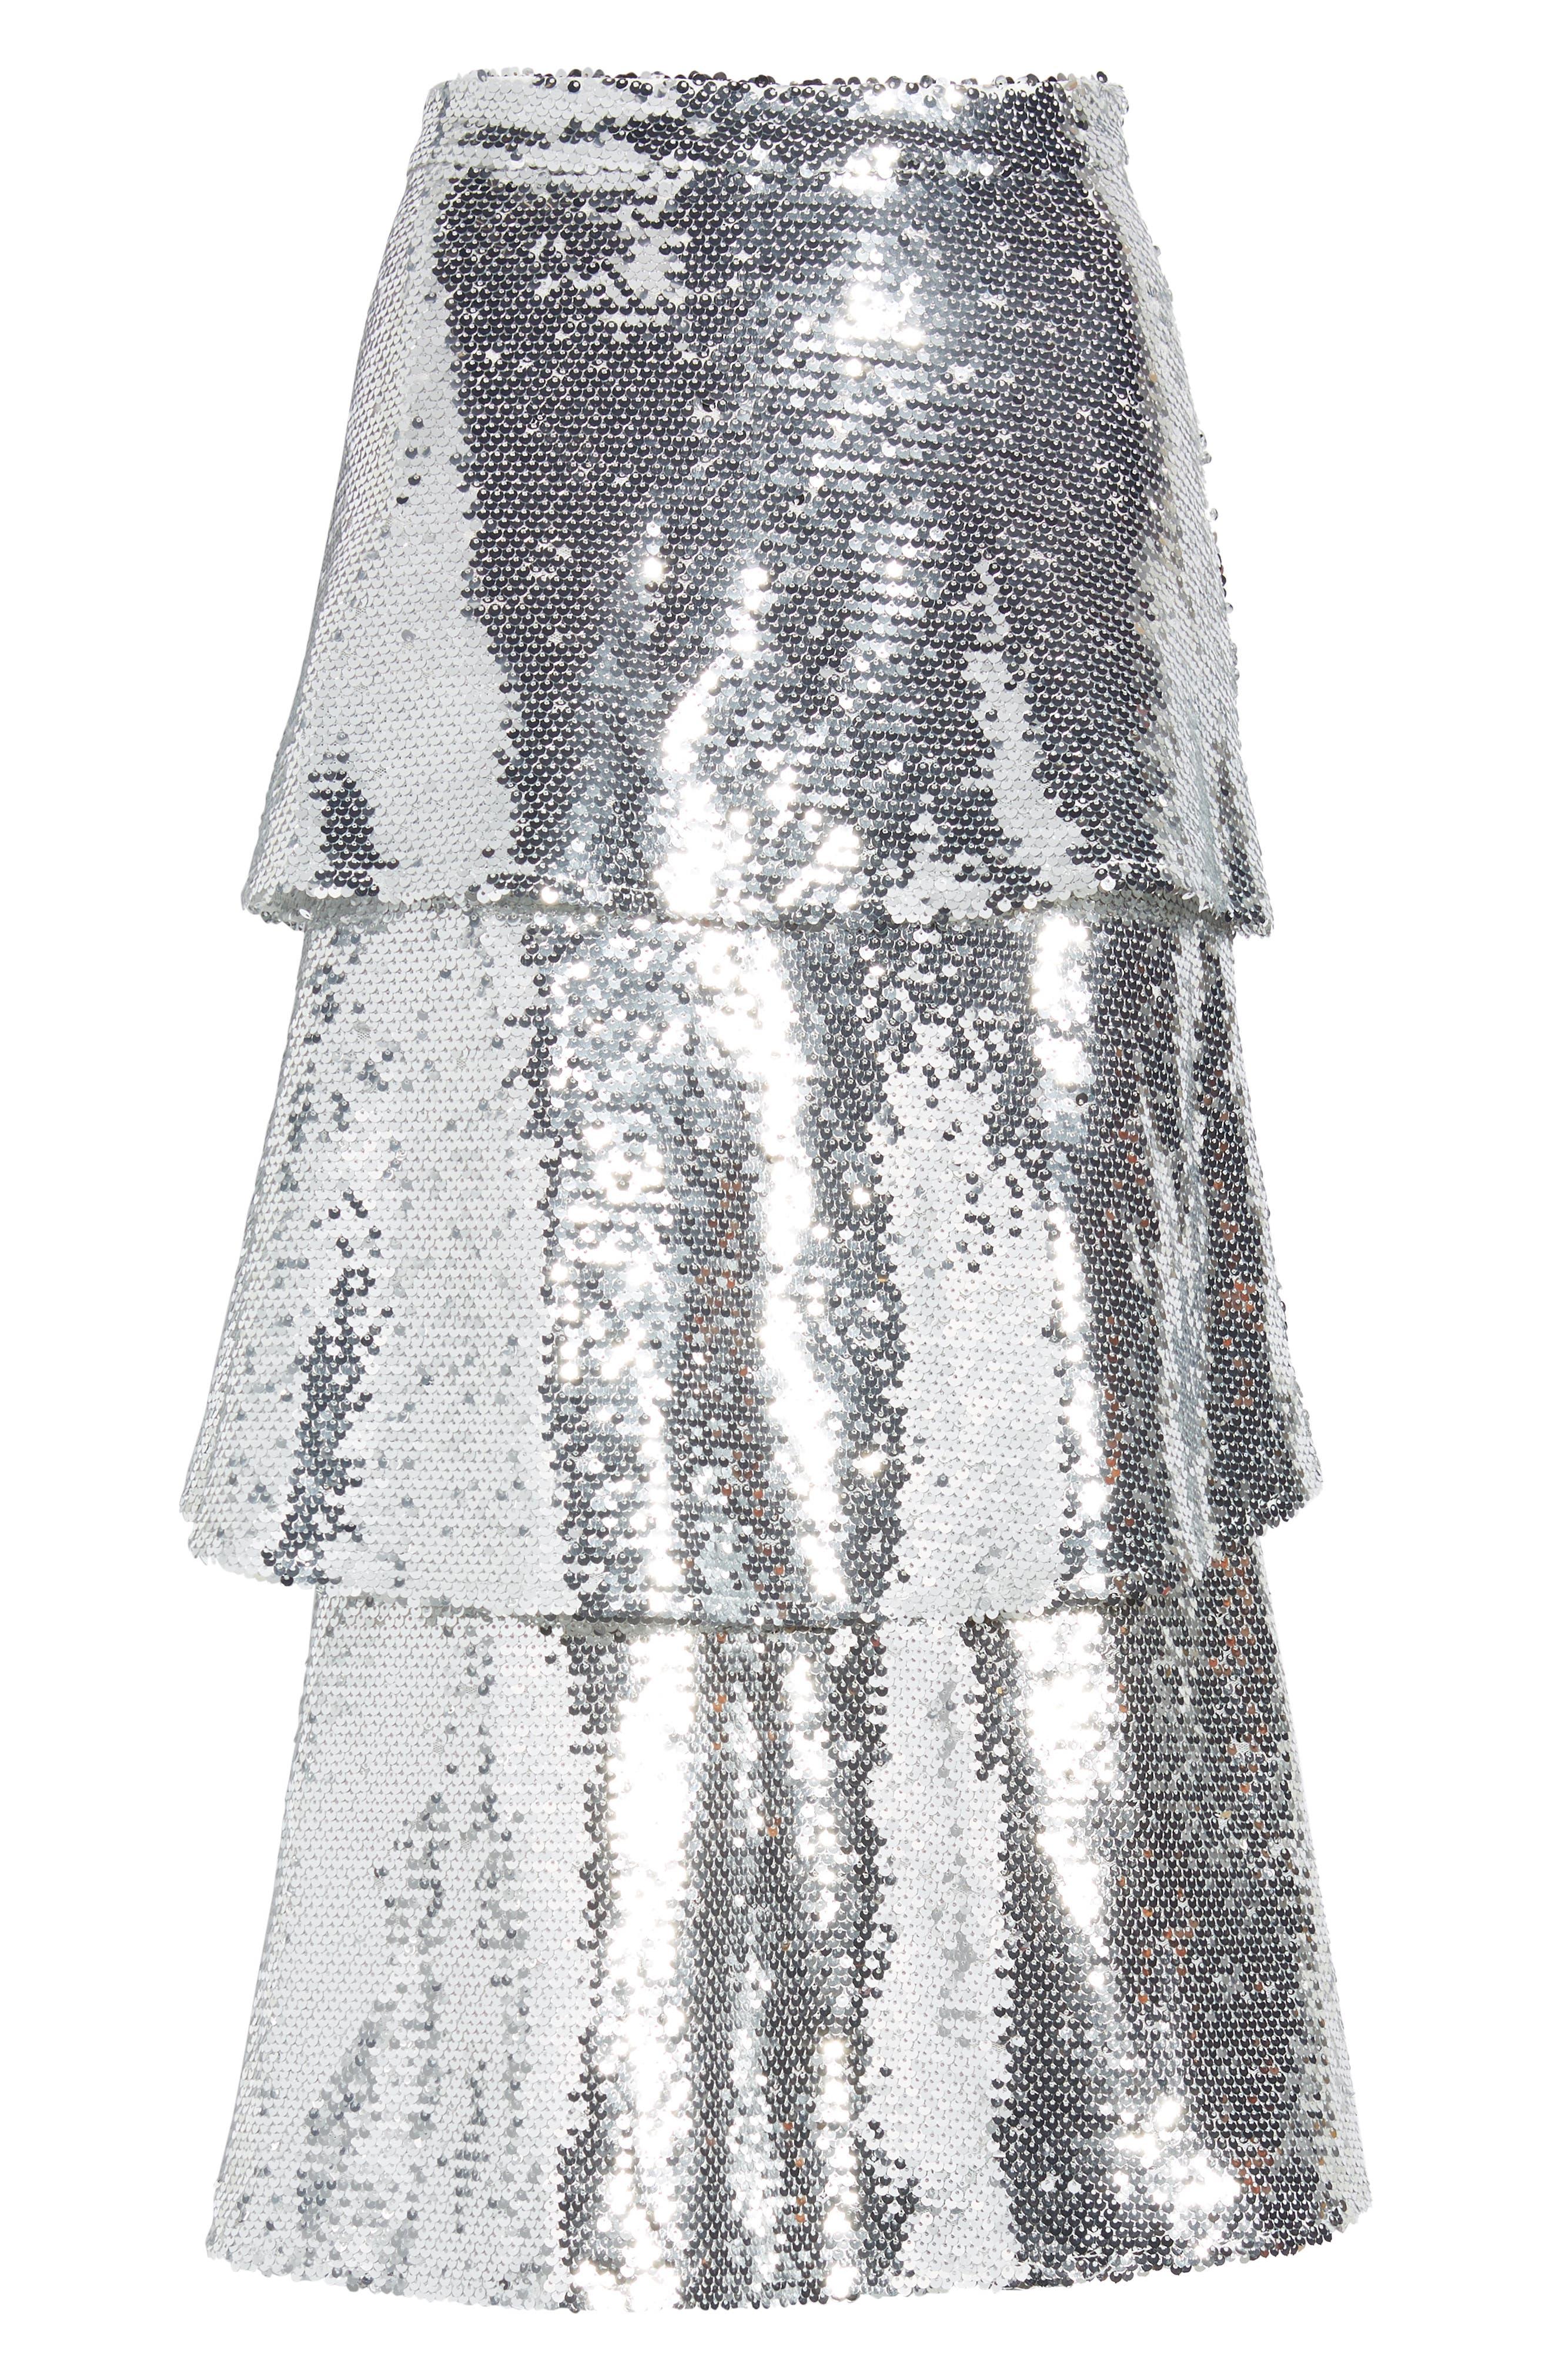 Tiered Sequin Midi Skirt,                             Alternate thumbnail 6, color,                             040